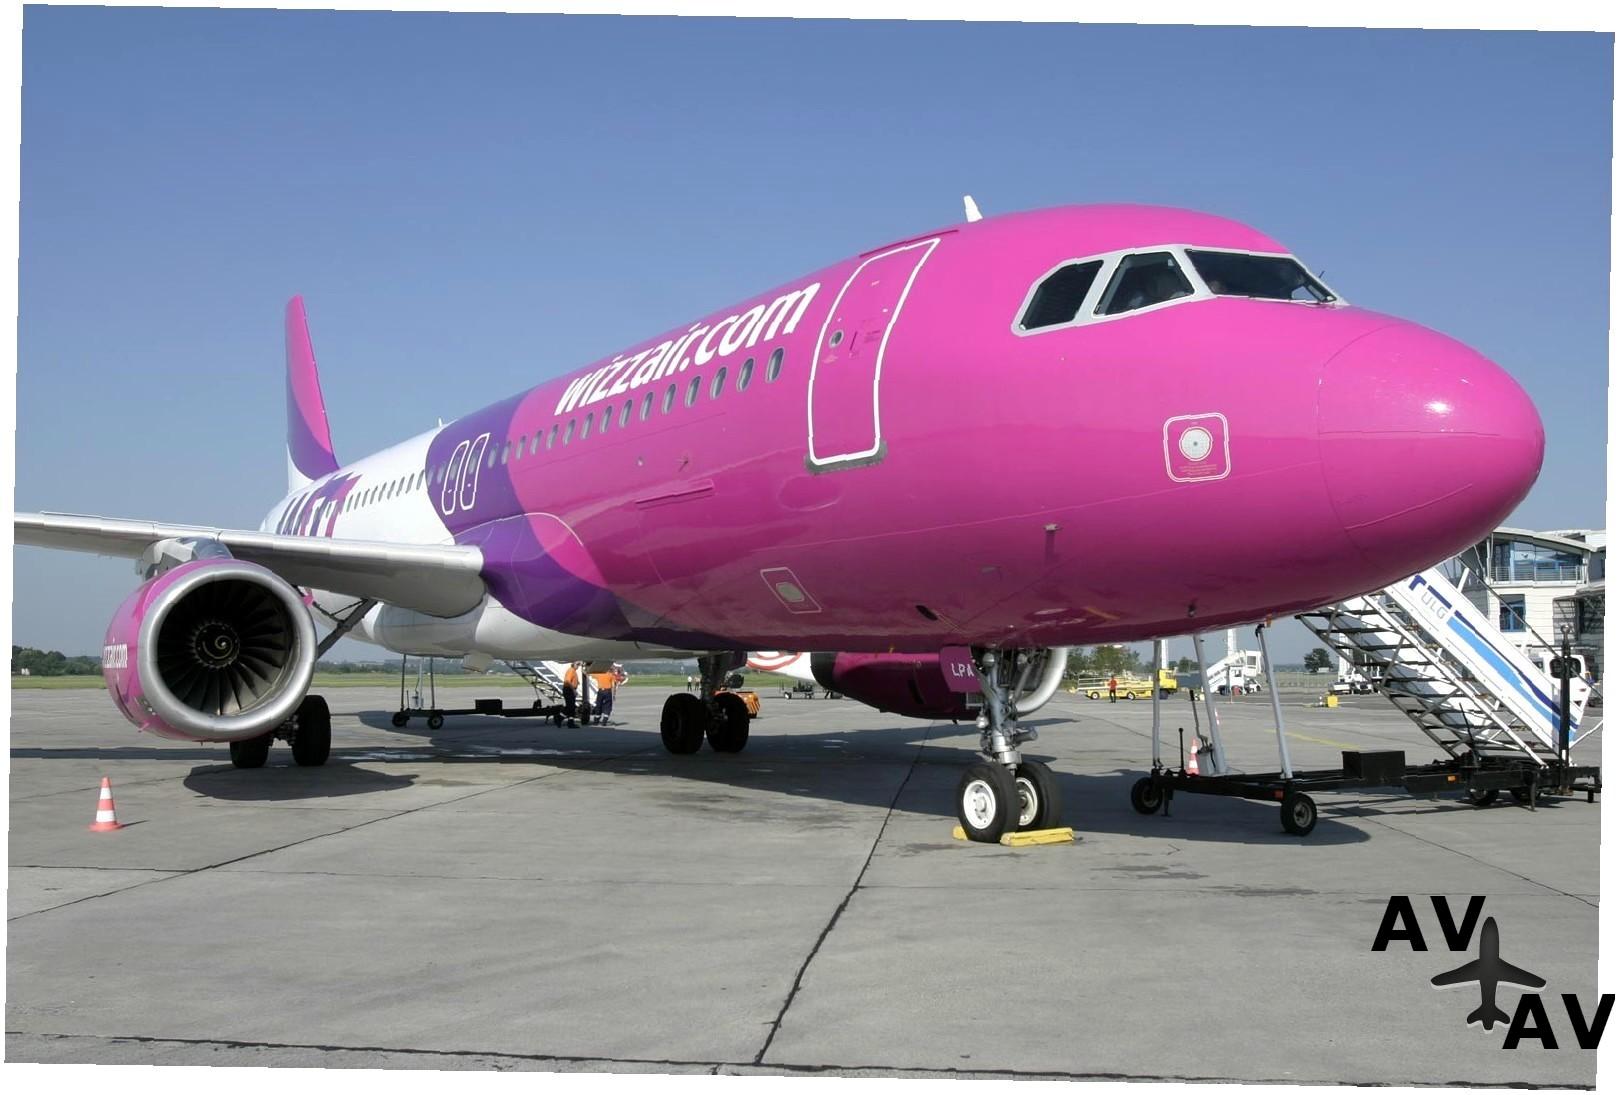 Антверпен заказать самолет город: Антверпен страна: Бельгия